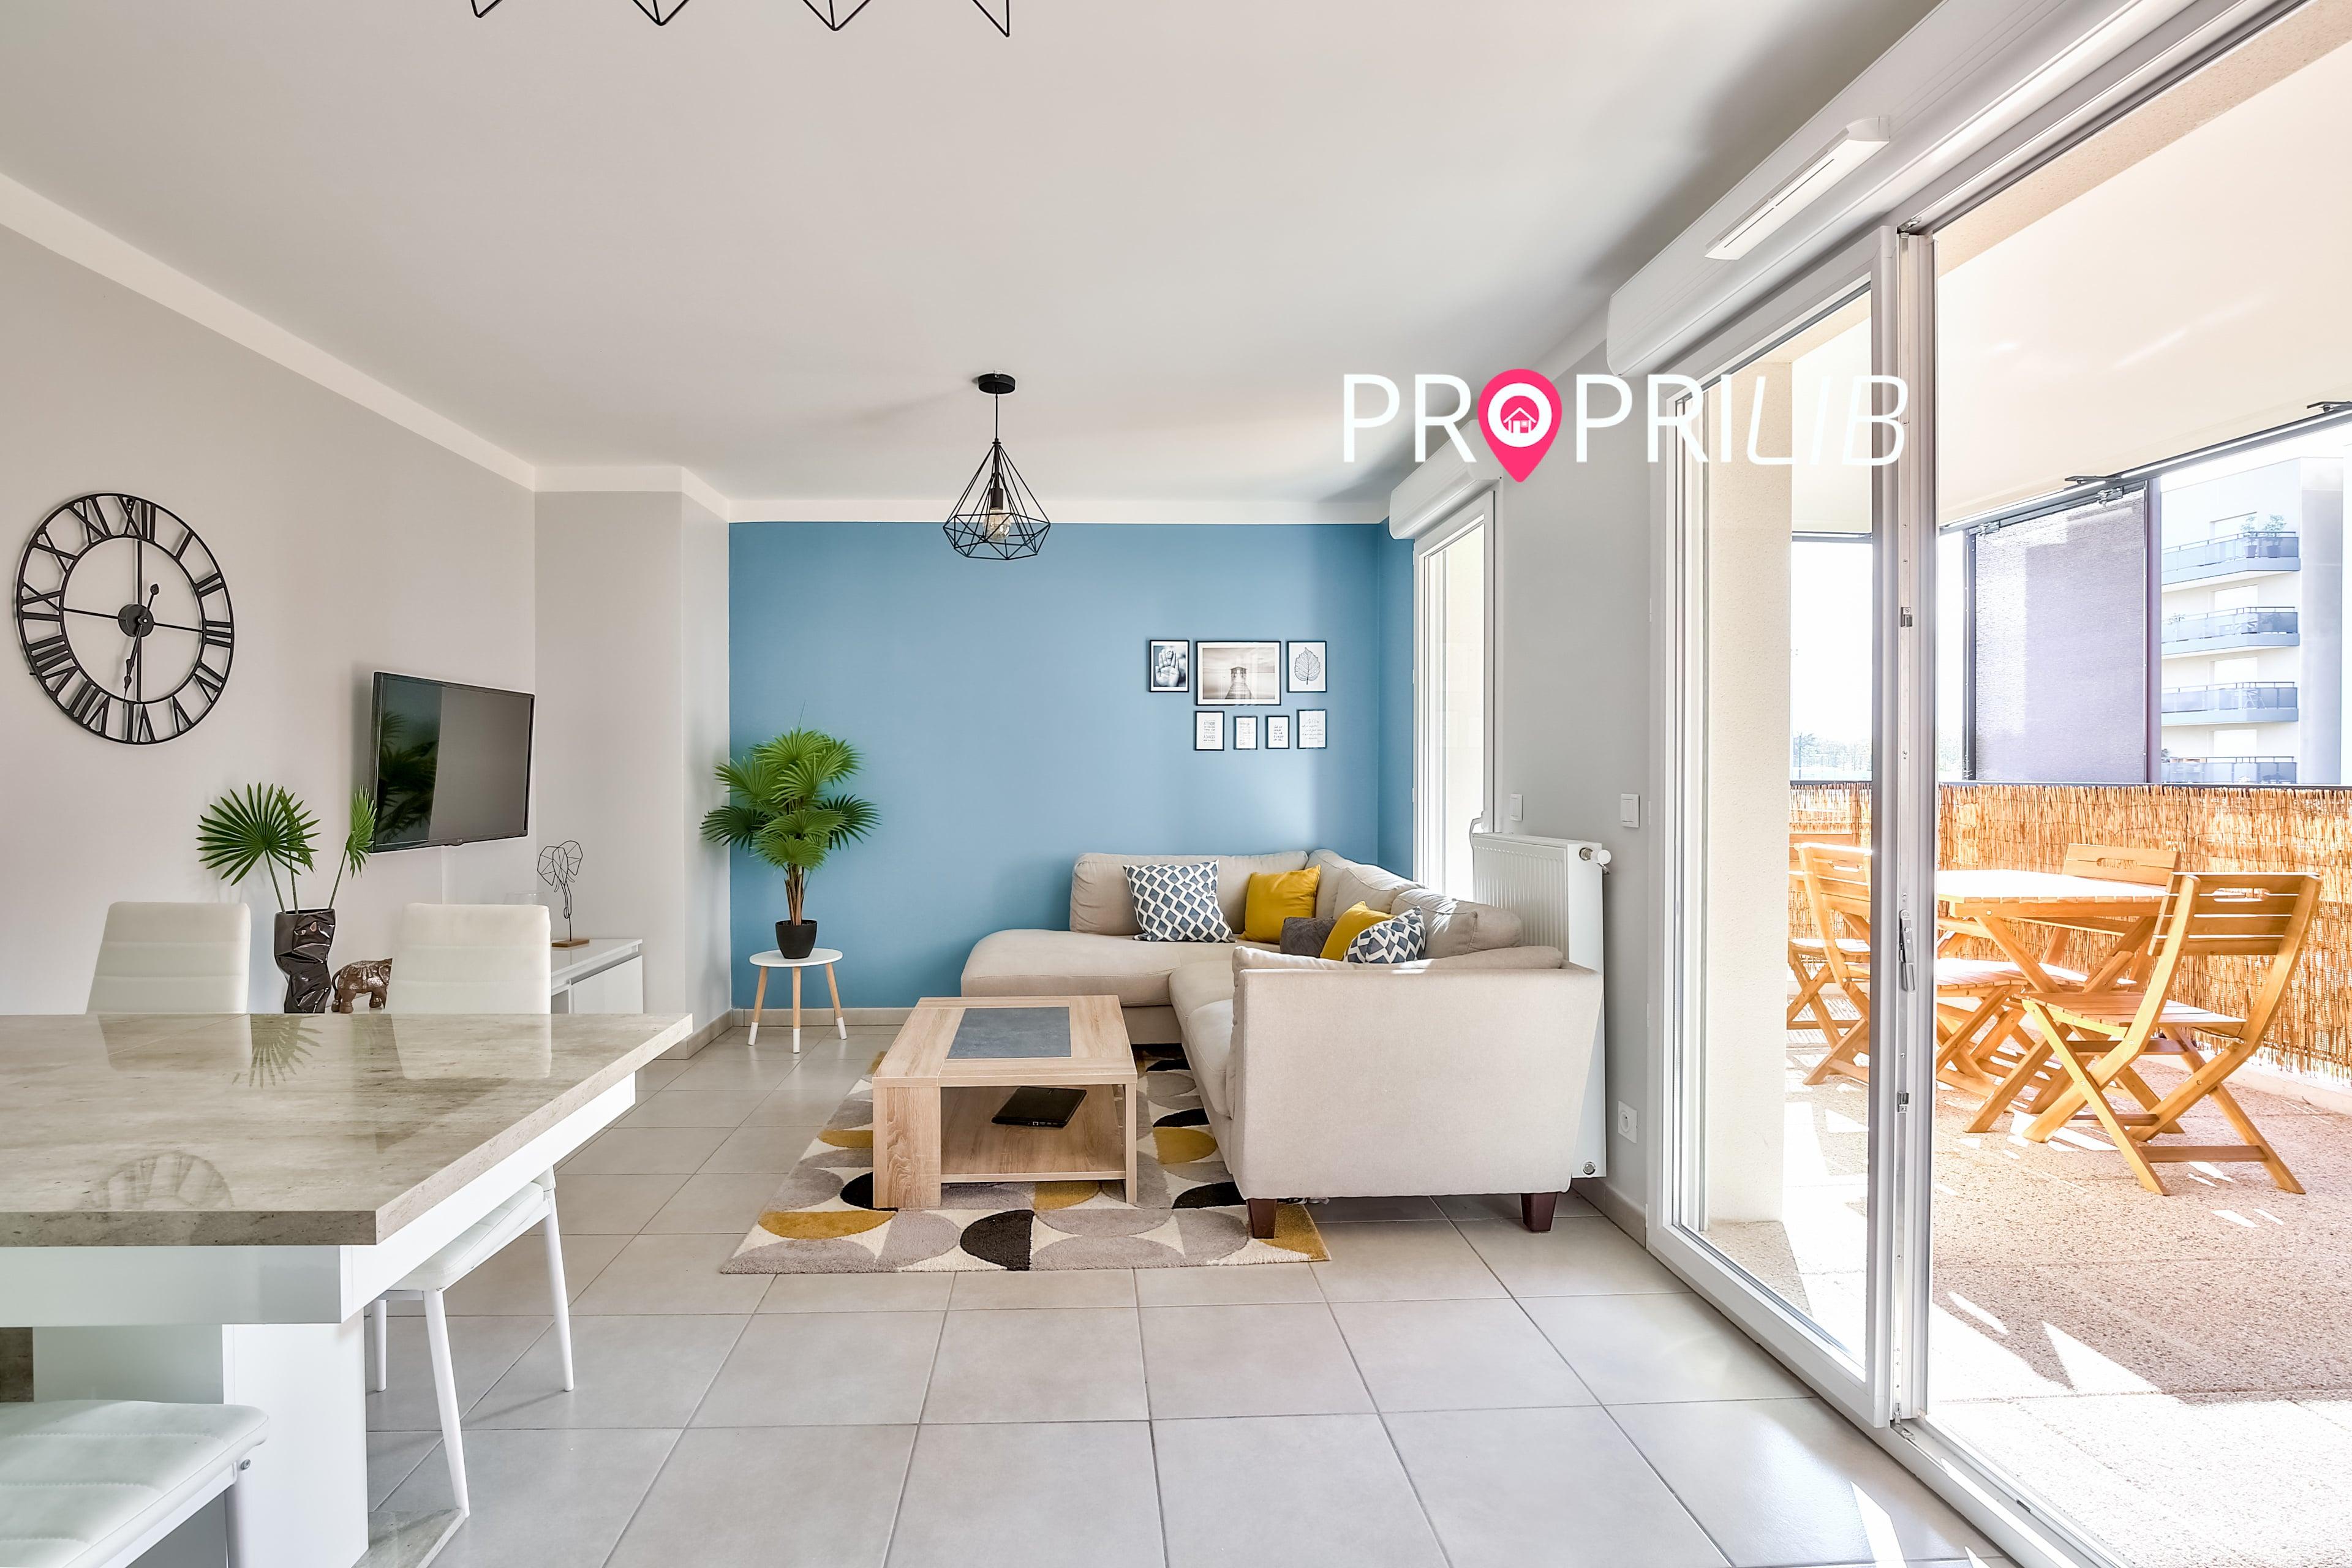 Meyzieu - Agence immobilière à prix fixe